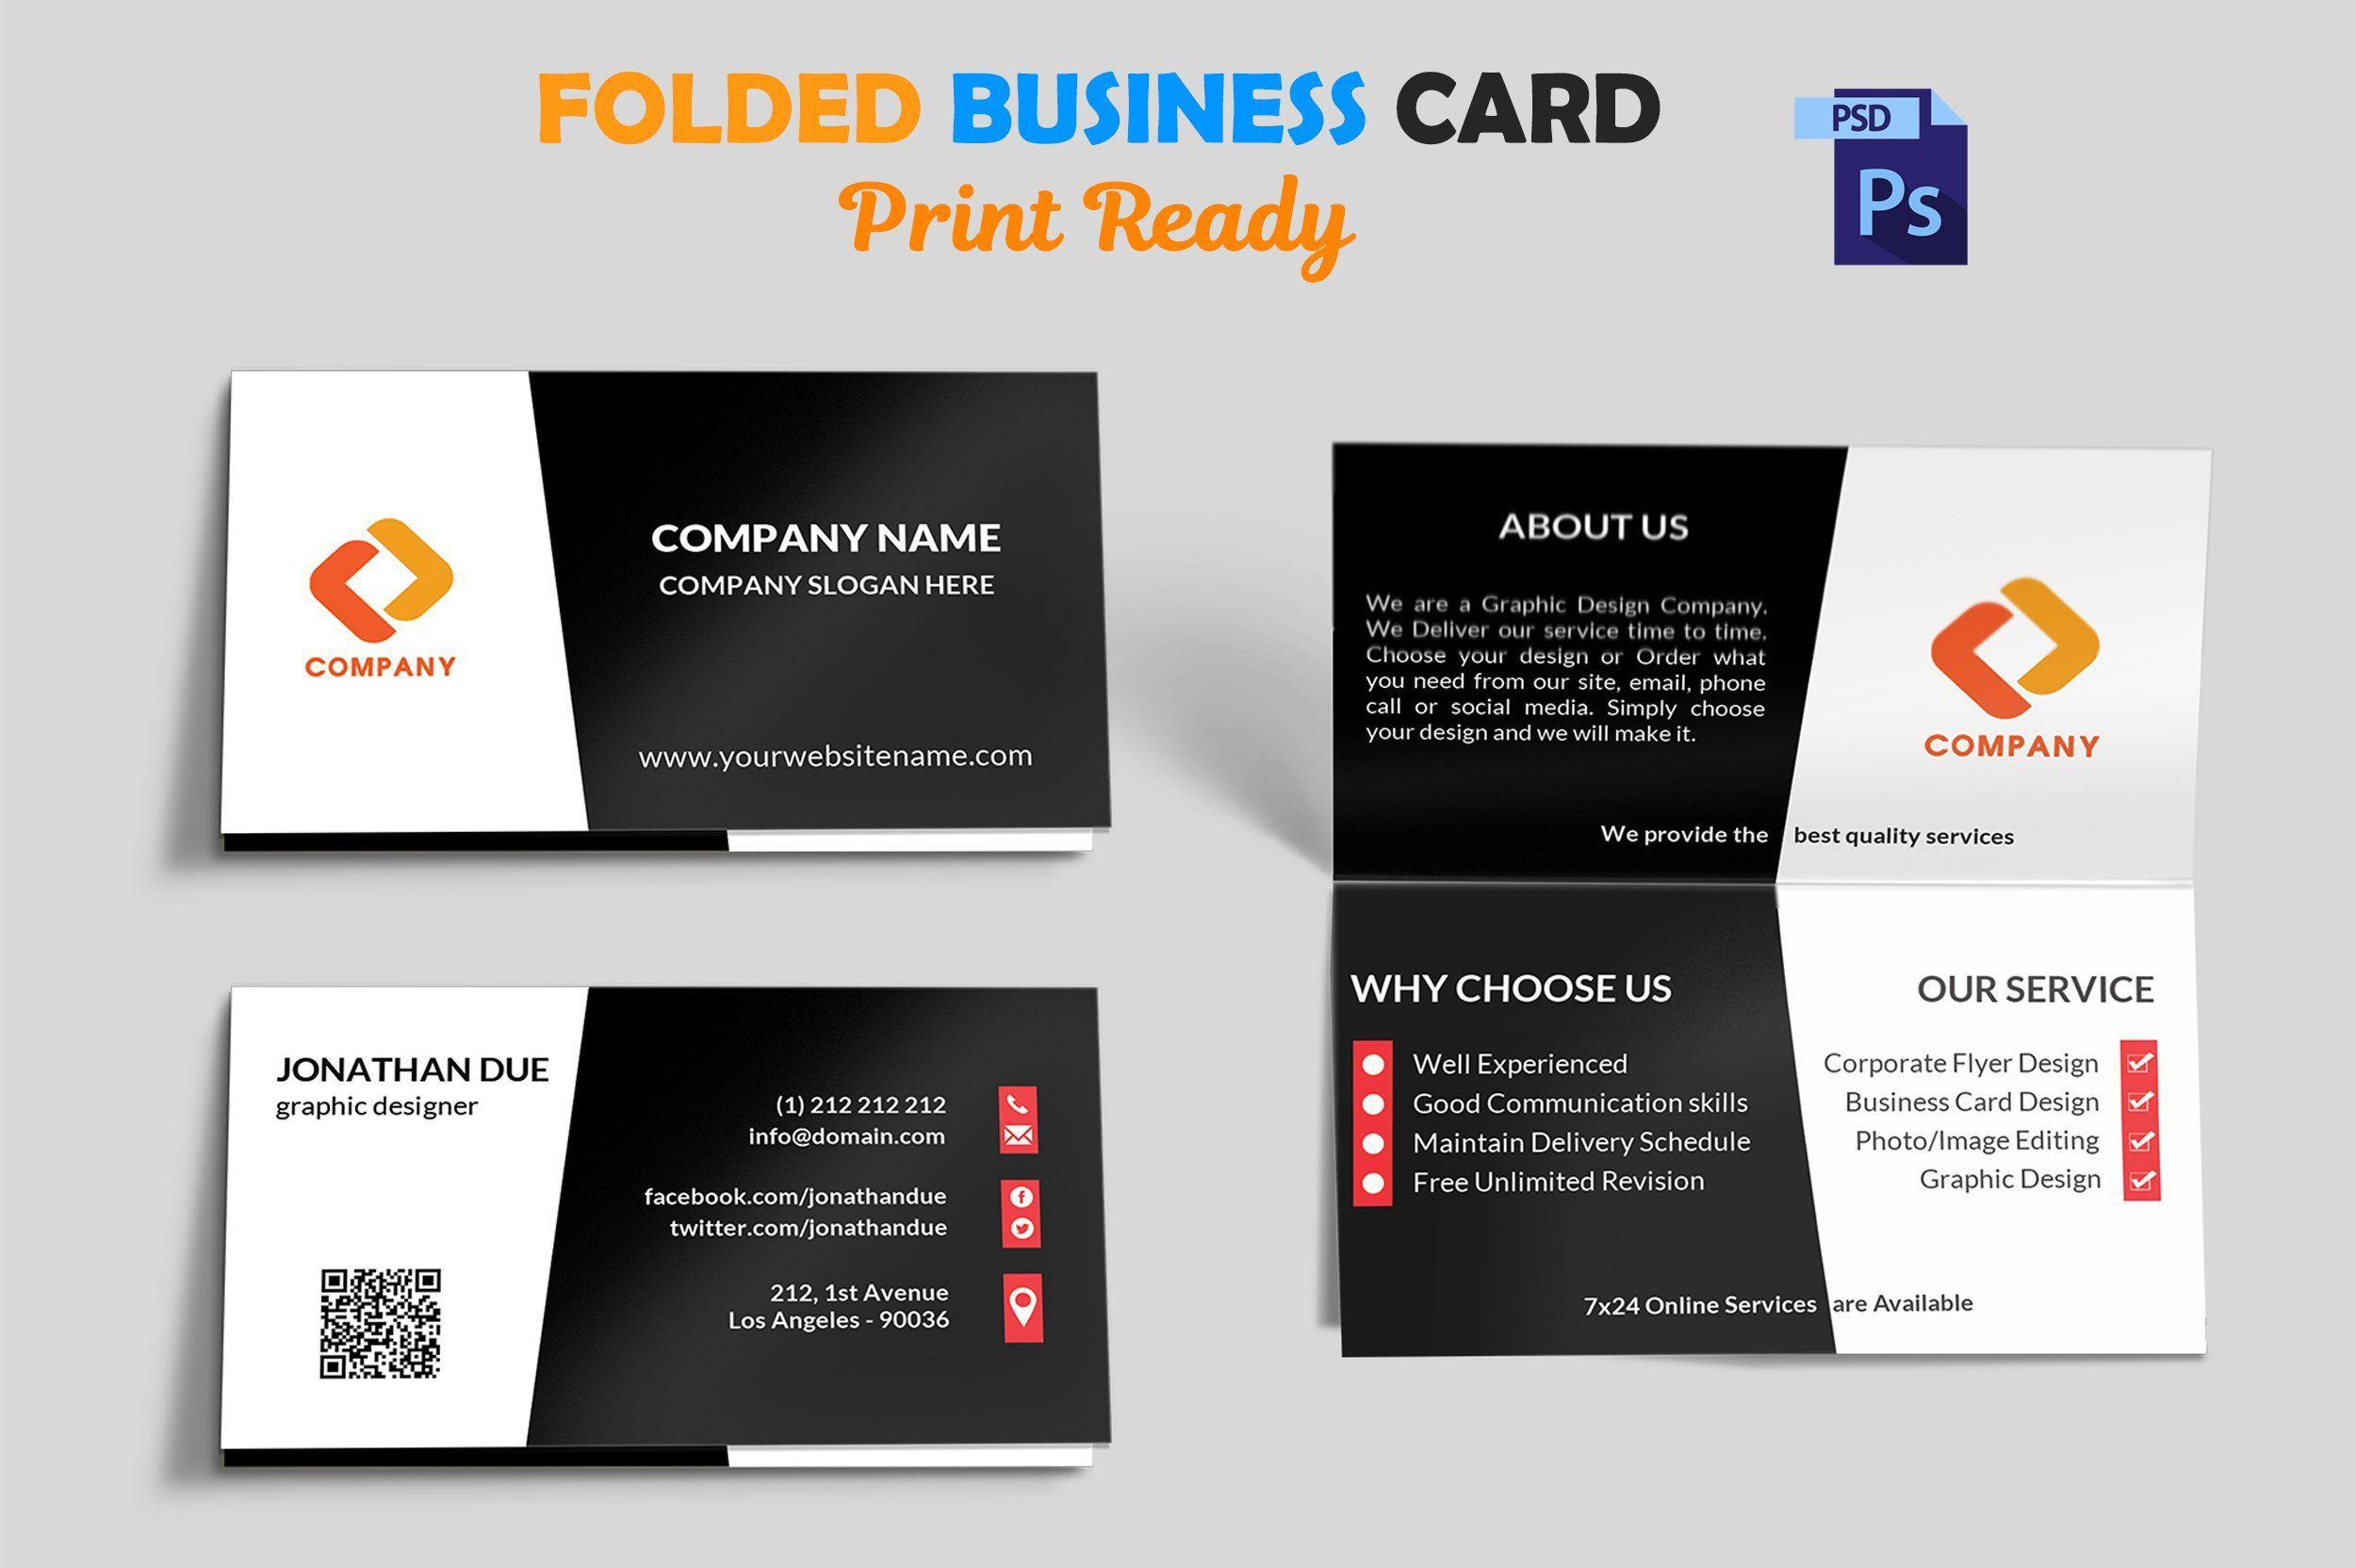 Folding Business Card Template Addictionary